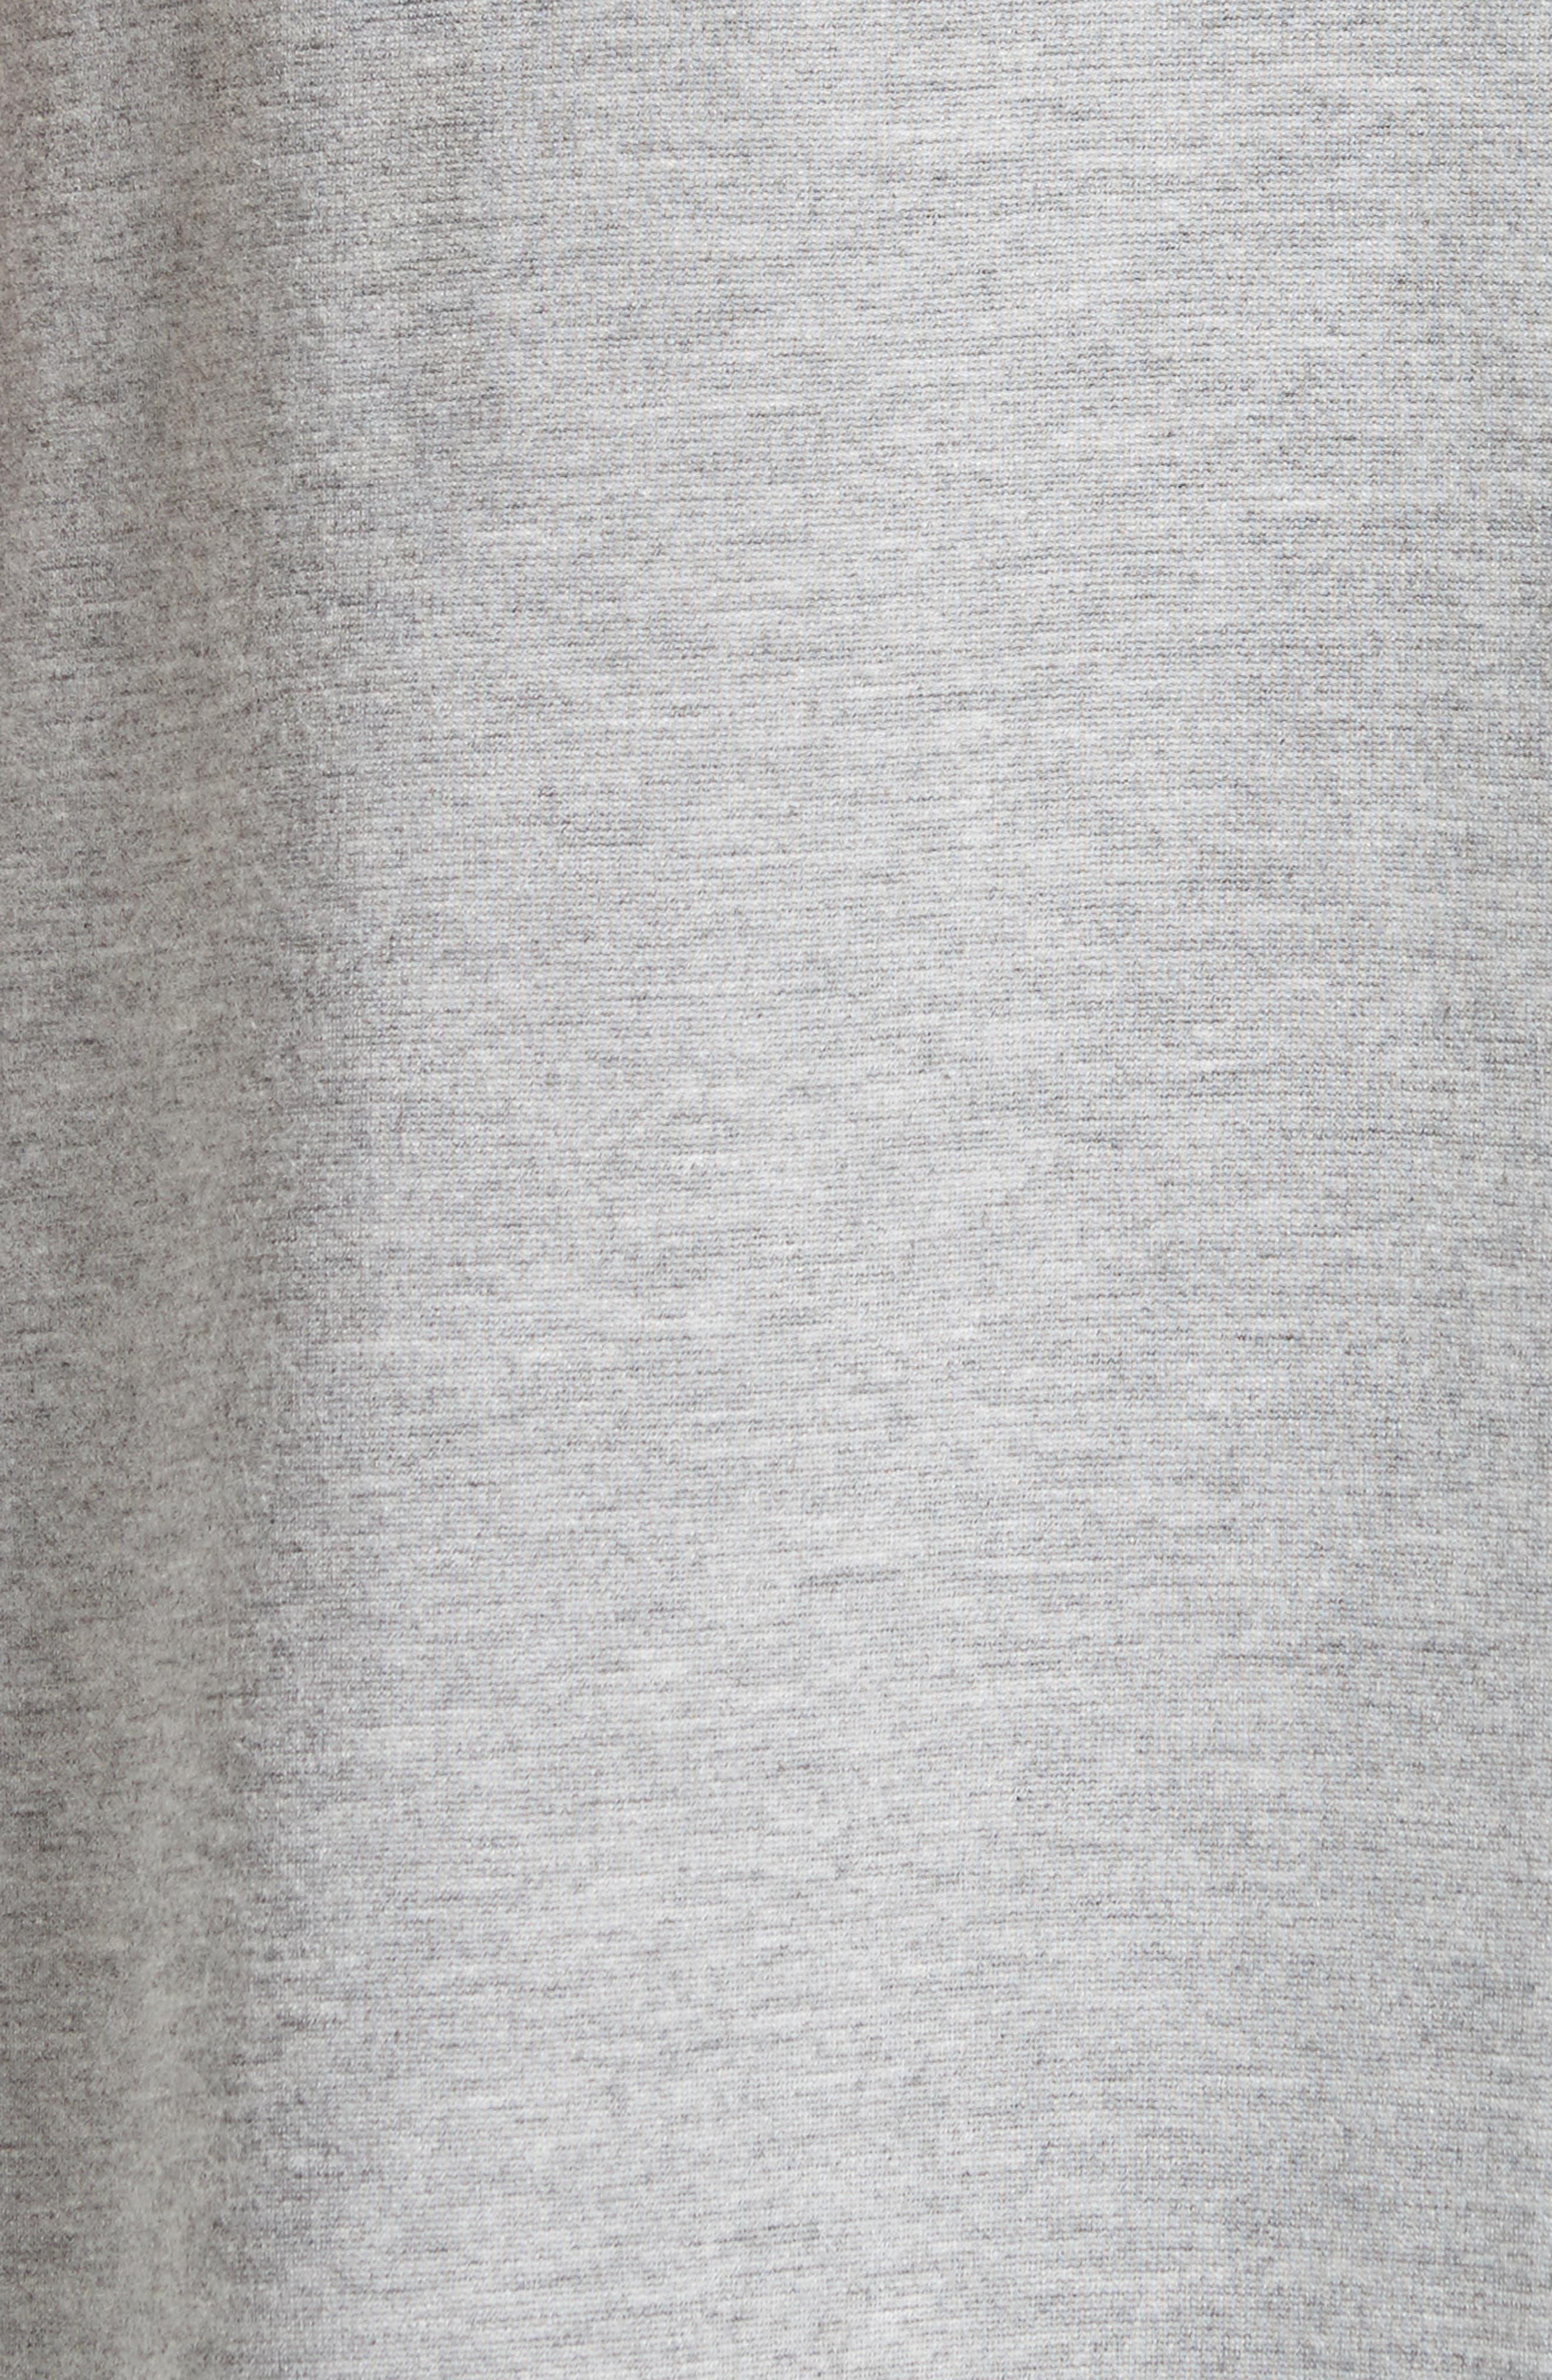 Ruched Midi Skirt,                             Alternate thumbnail 5, color,